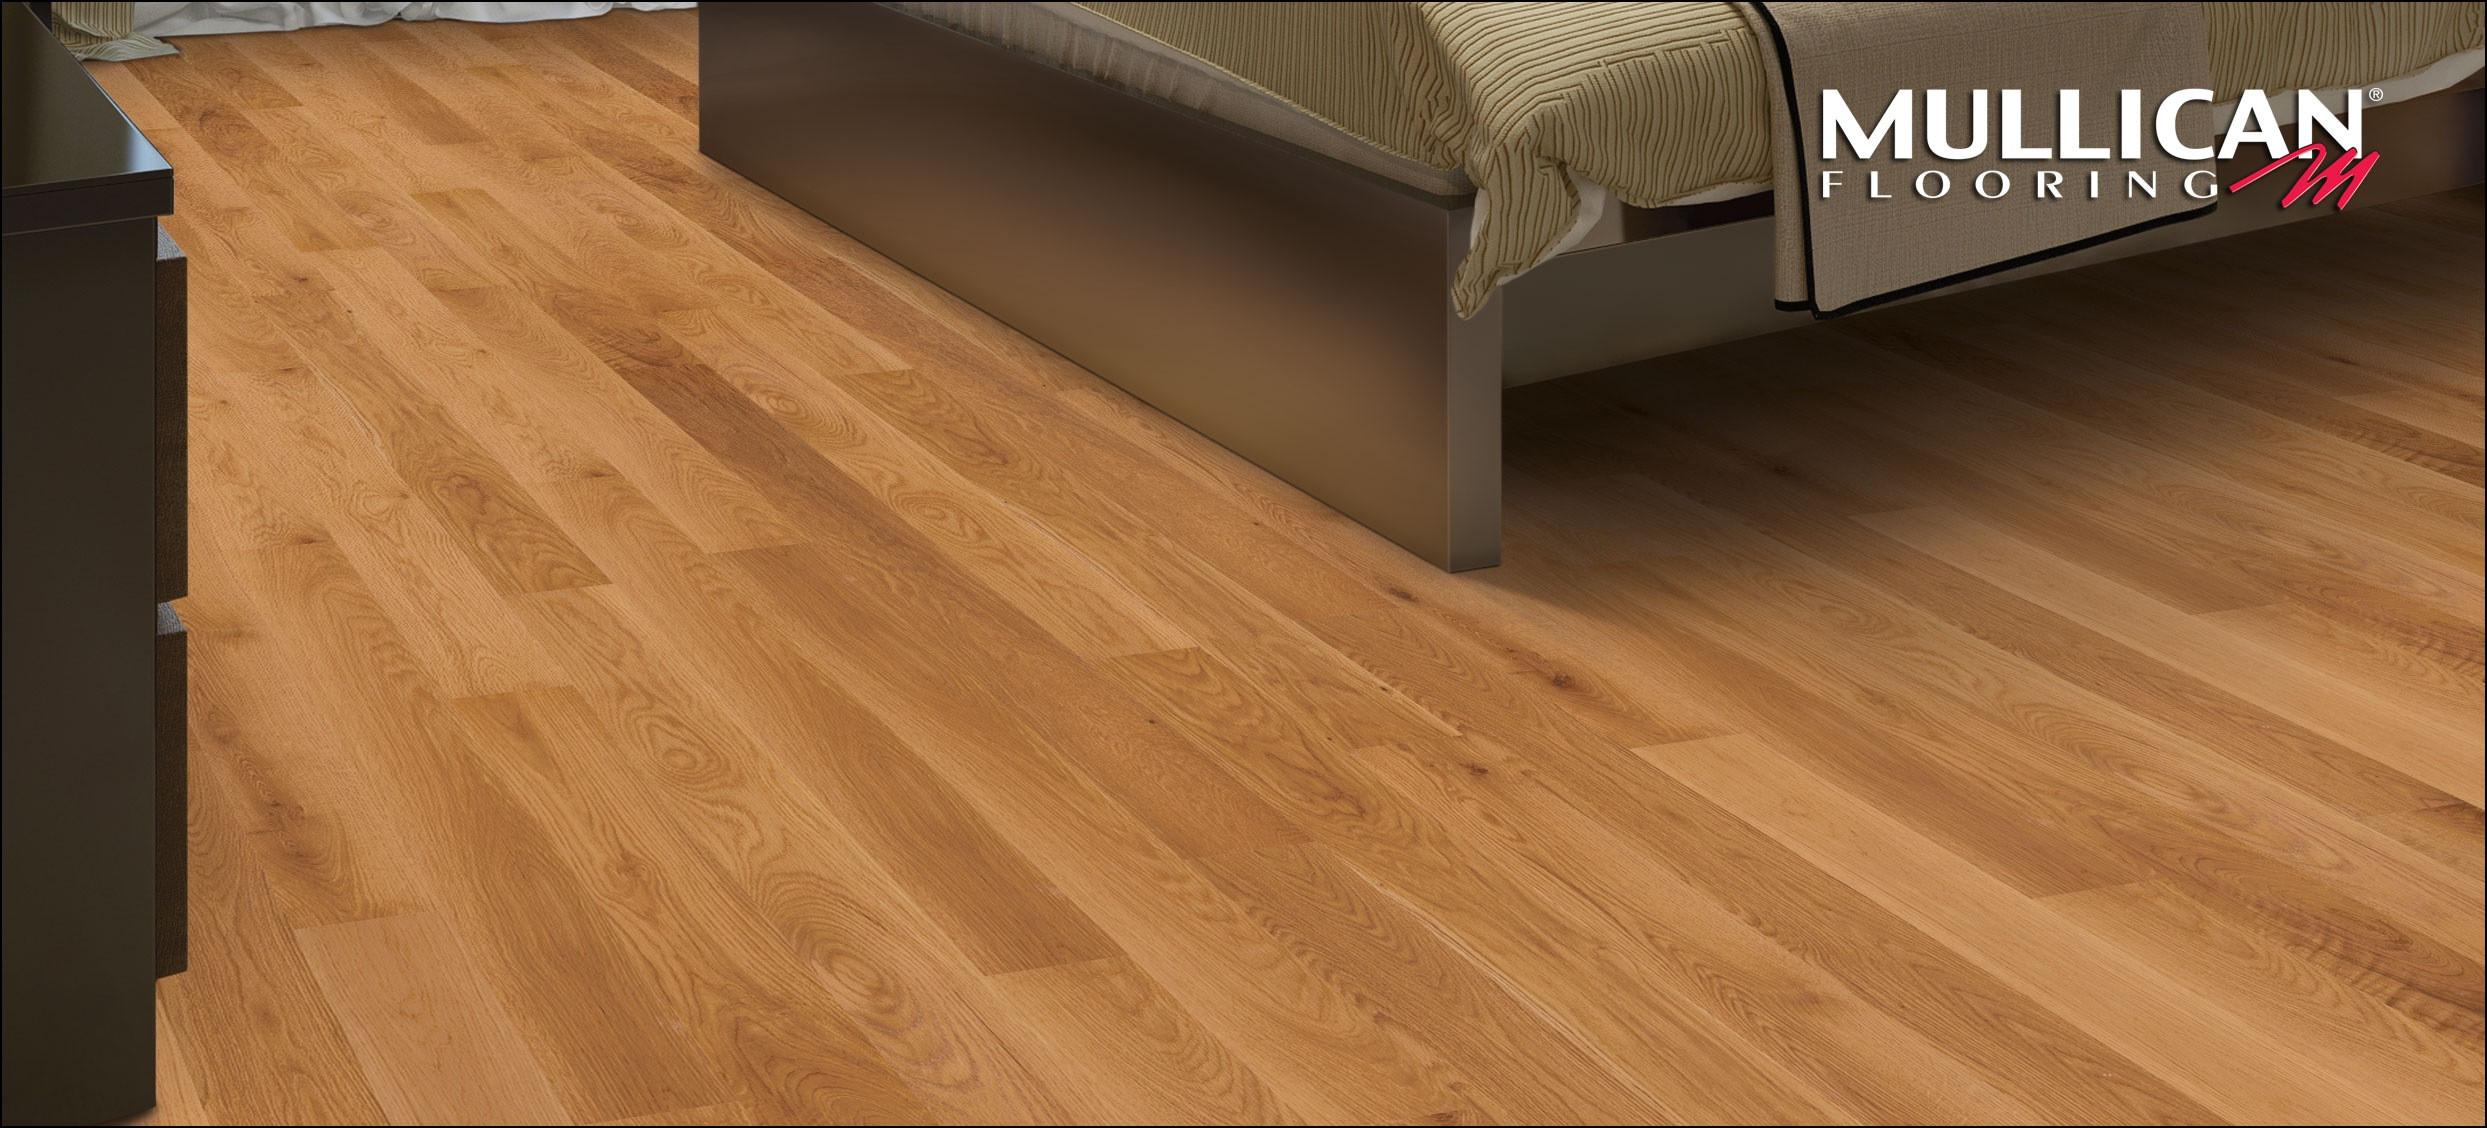 hardwood floor store of hardwood flooring suppliers france flooring ideas intended for hardwood flooring installation san diego collection mullican flooring home of hardwood flooring installation san diego